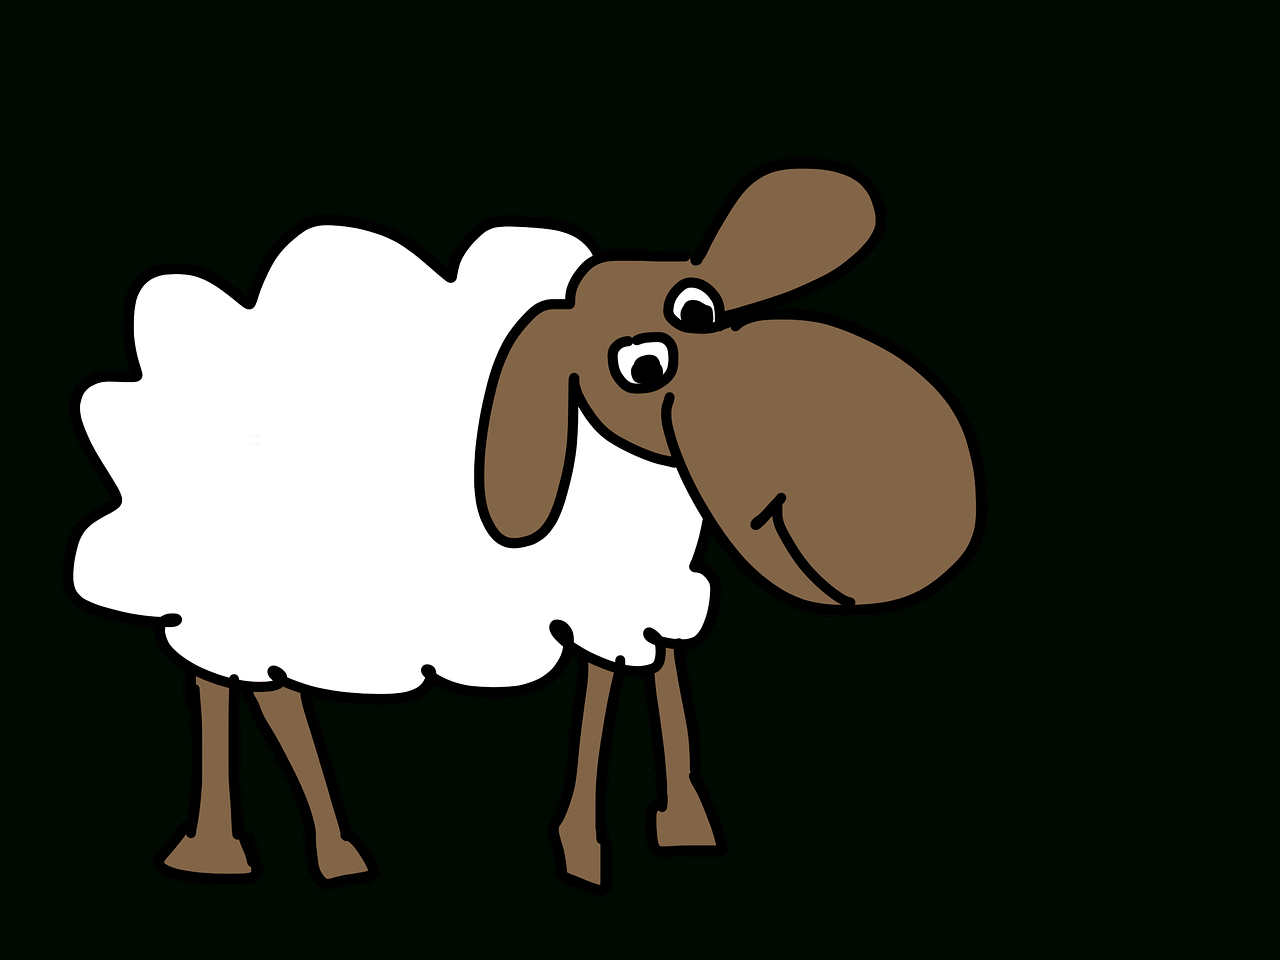 Domba Gambar Kartun Wol   Gambar Gratis Di Pixabay with regard to Gambar Domba Animasi